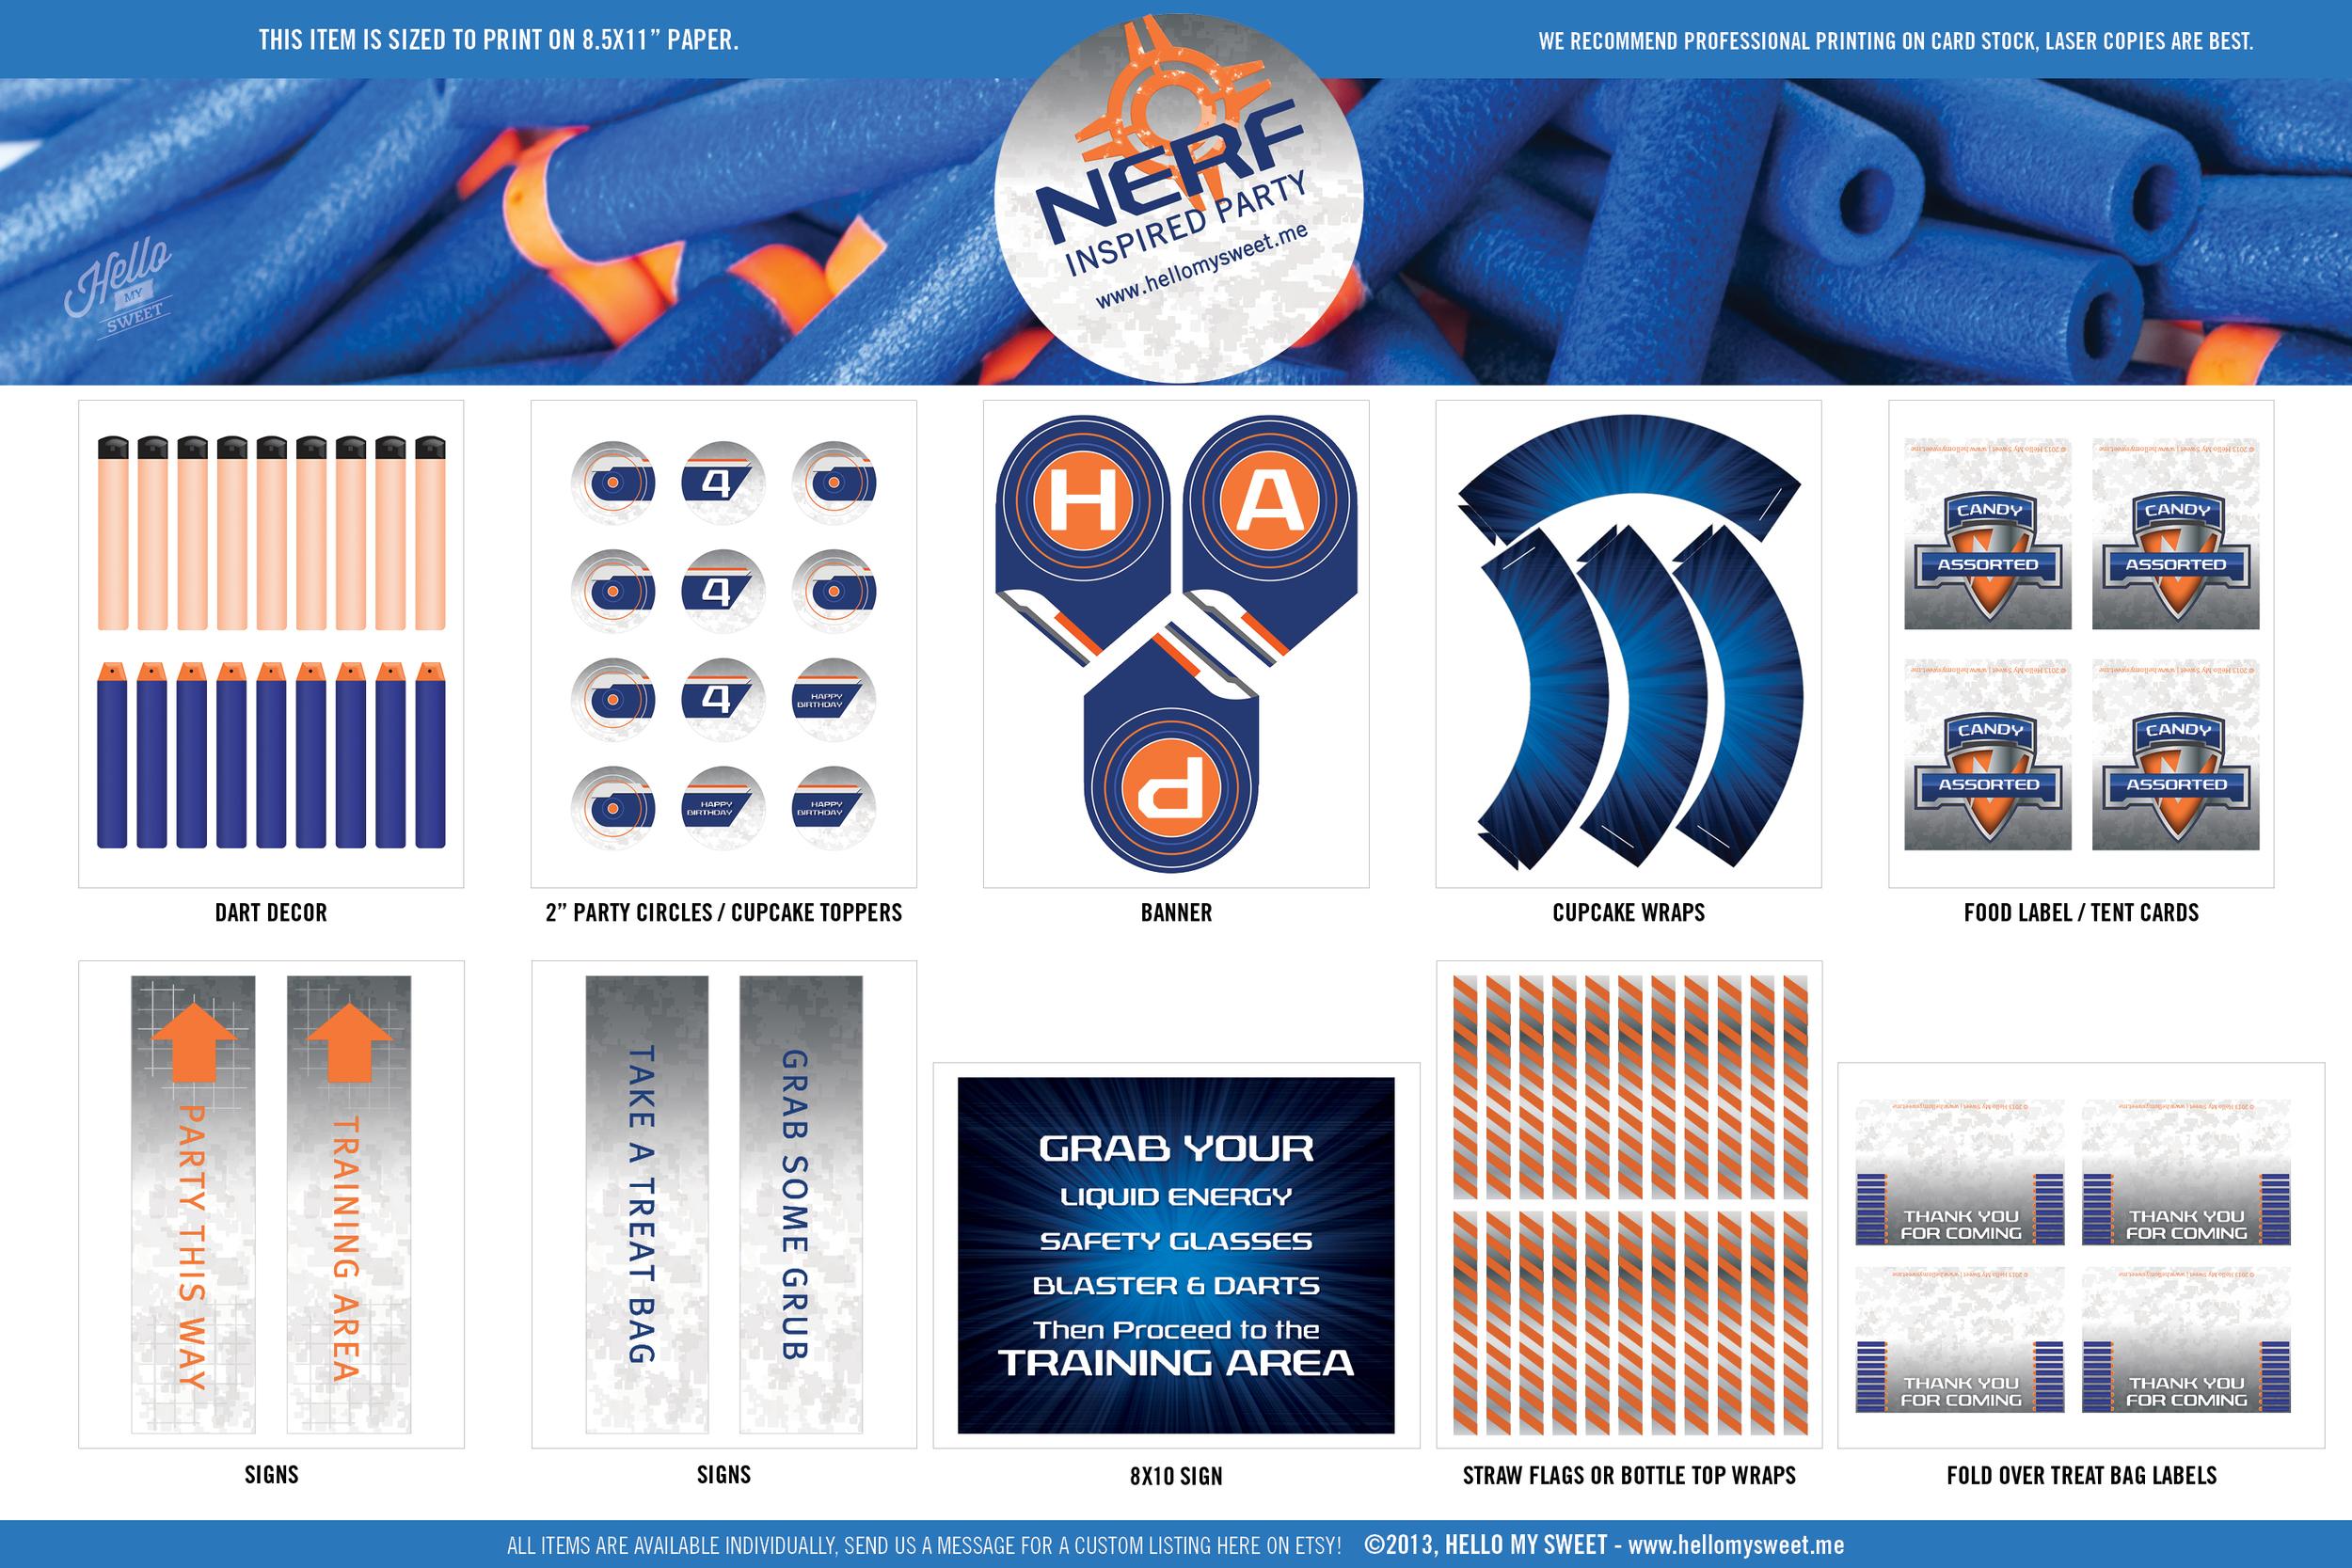 image regarding Nerf Target Printable referred to as NERF Impressed Birthday Social gathering Hi My Lovable